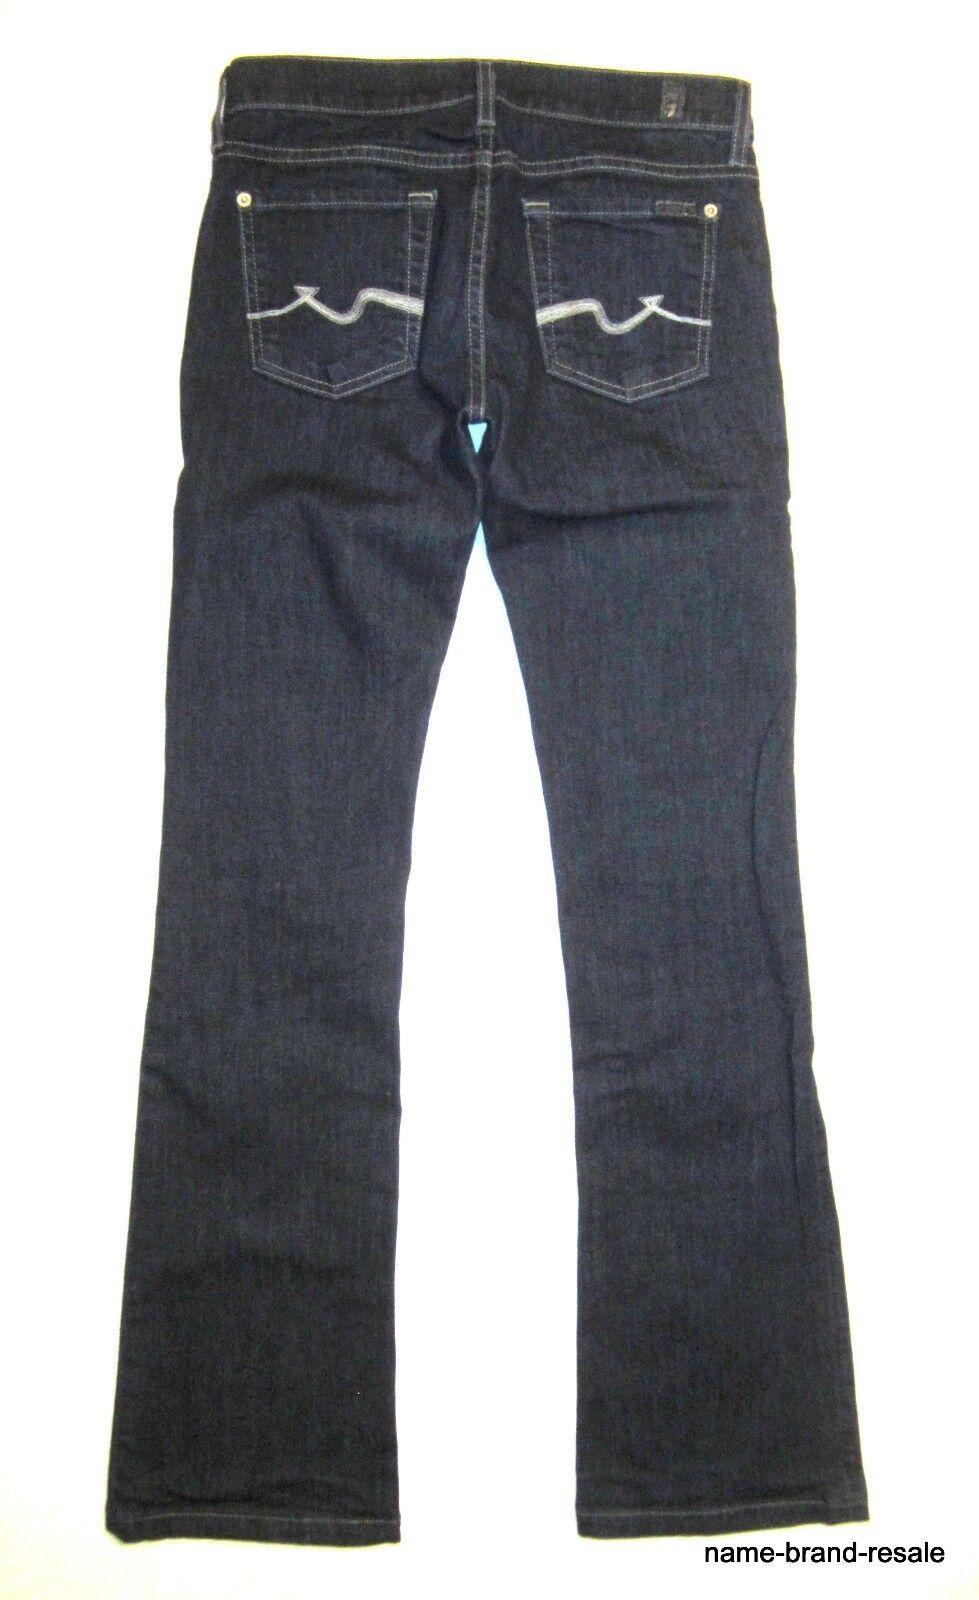 7 FOR ALL MANKIND Womens Jeans 26 x 32 BOOTCUT Dark Denim Wash Boot Cut